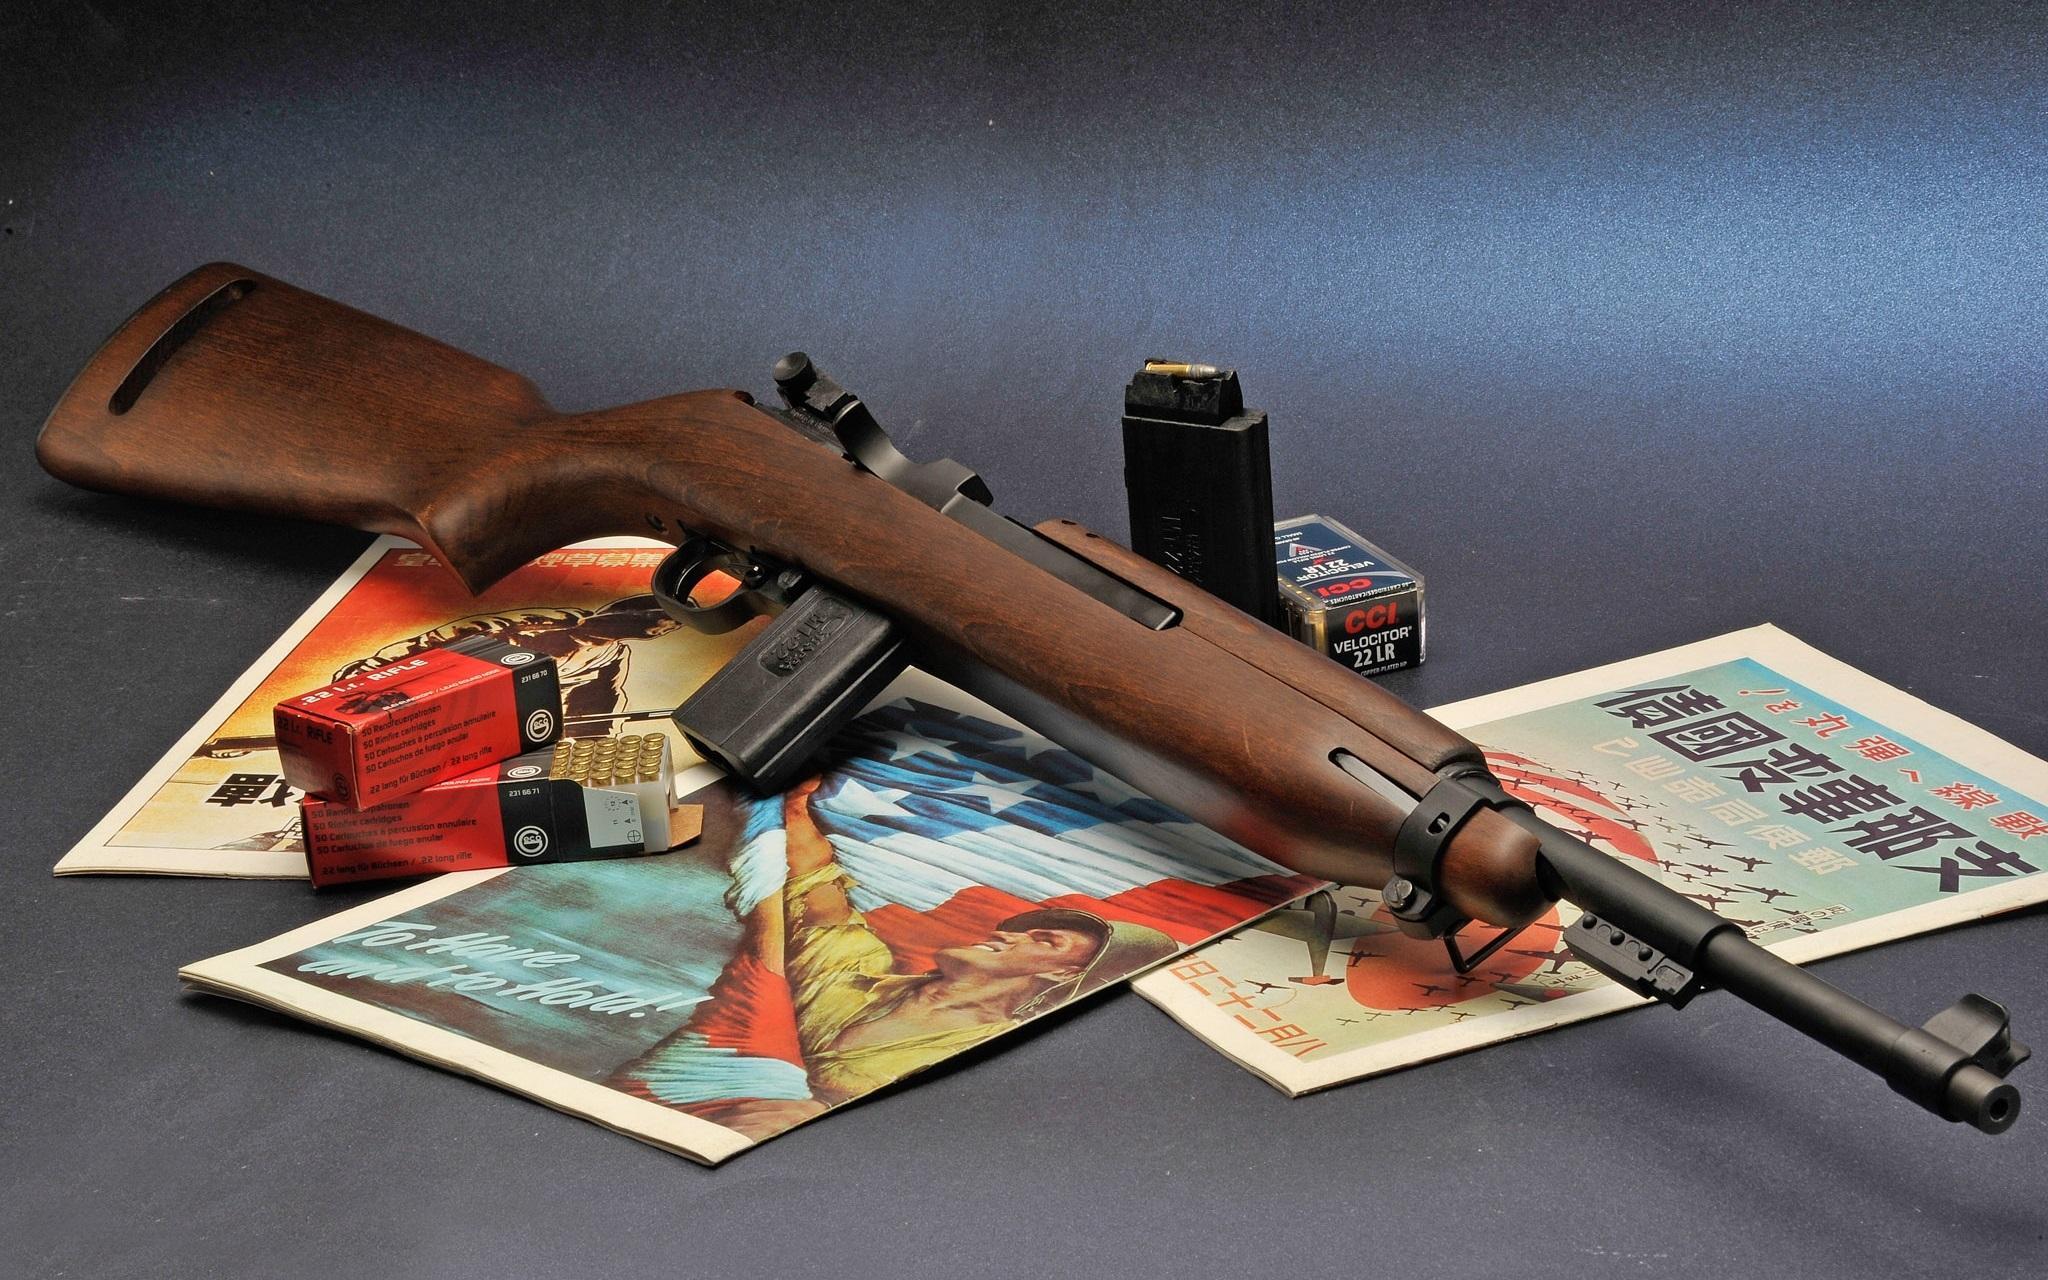 m2 carbine hd wallpaper background image 2048x1280 id 673095